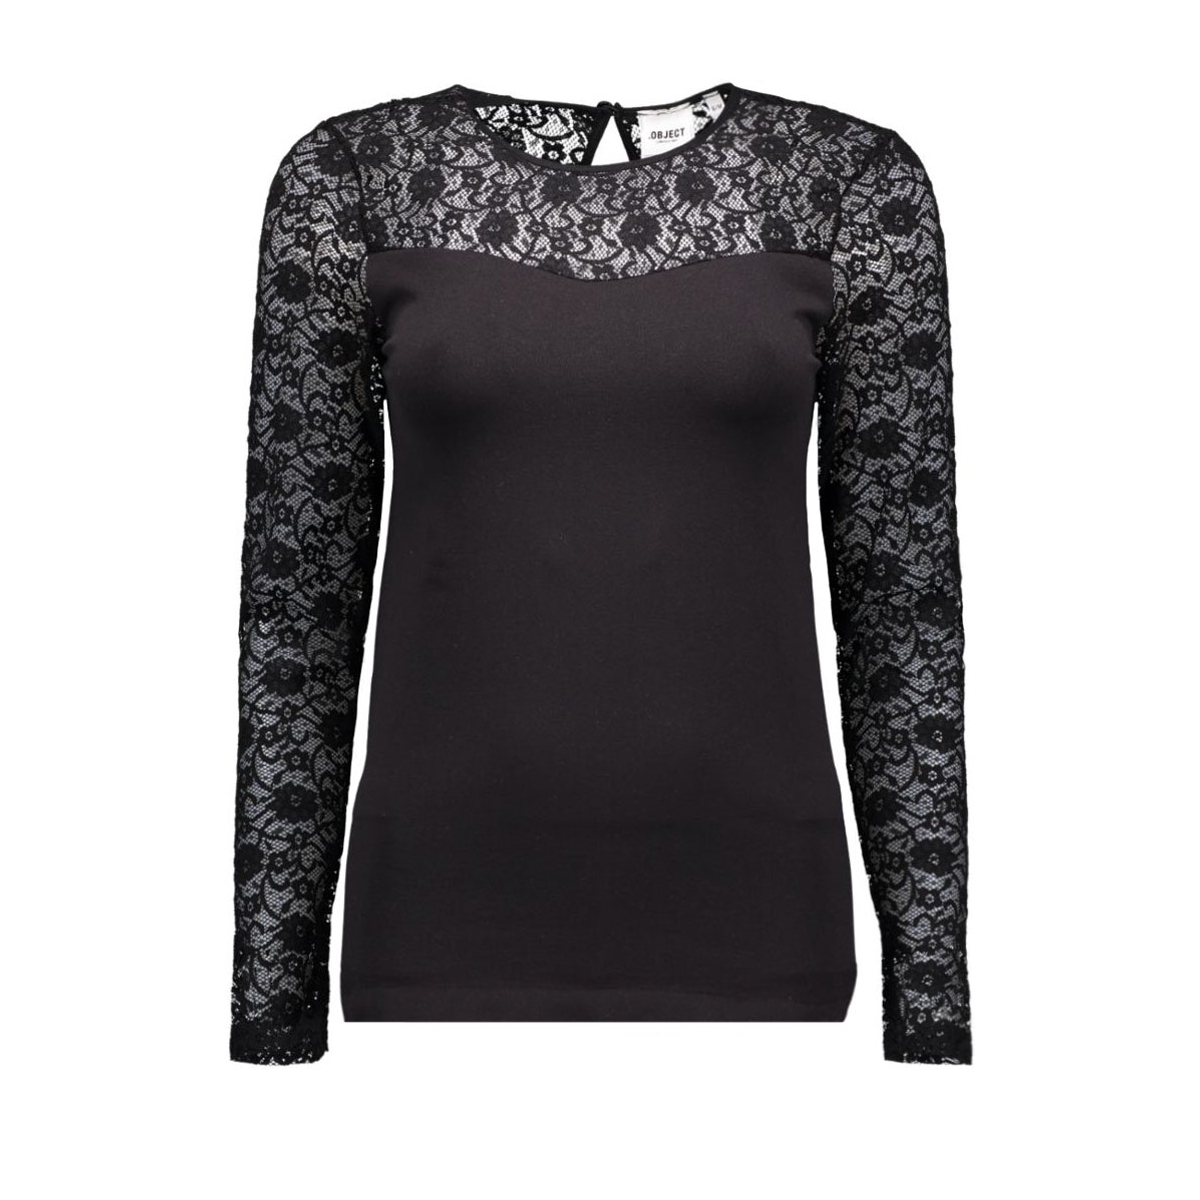 objlip lace l/s top noos 23021782 object t-shirt black